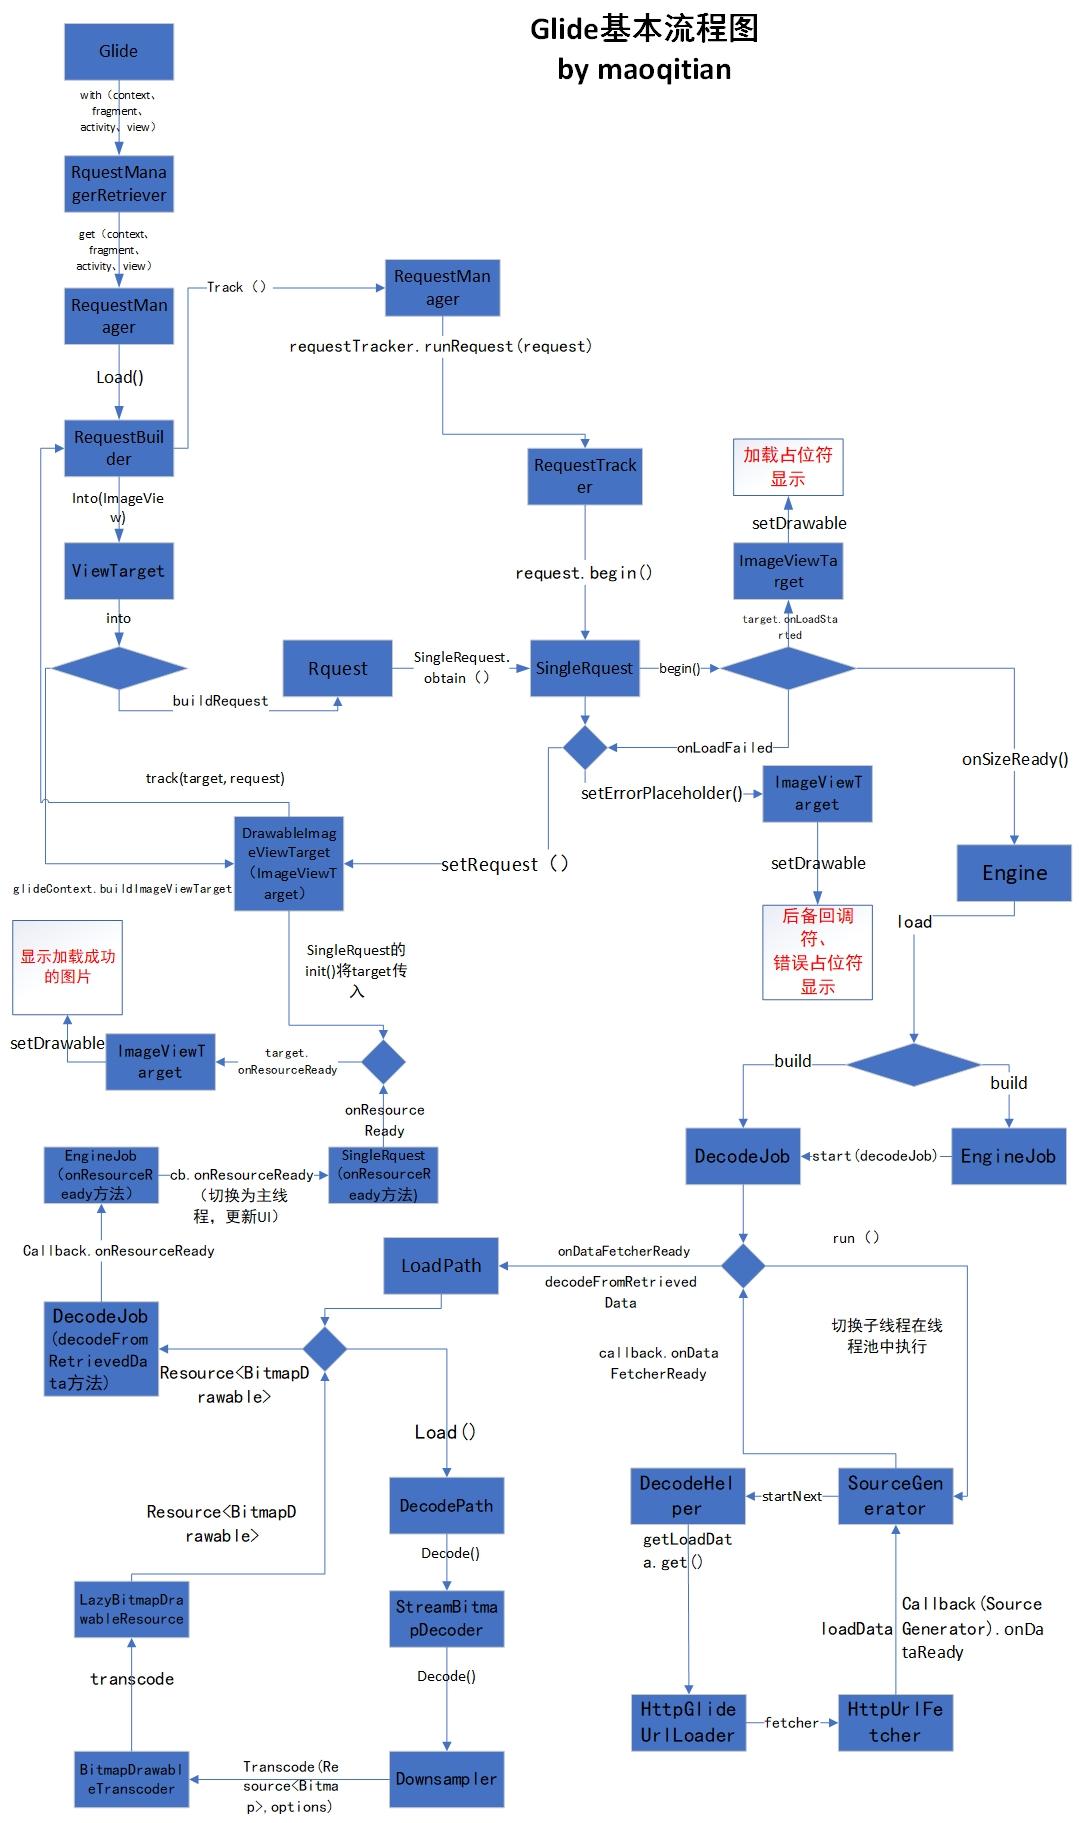 Glide加载基本流程图